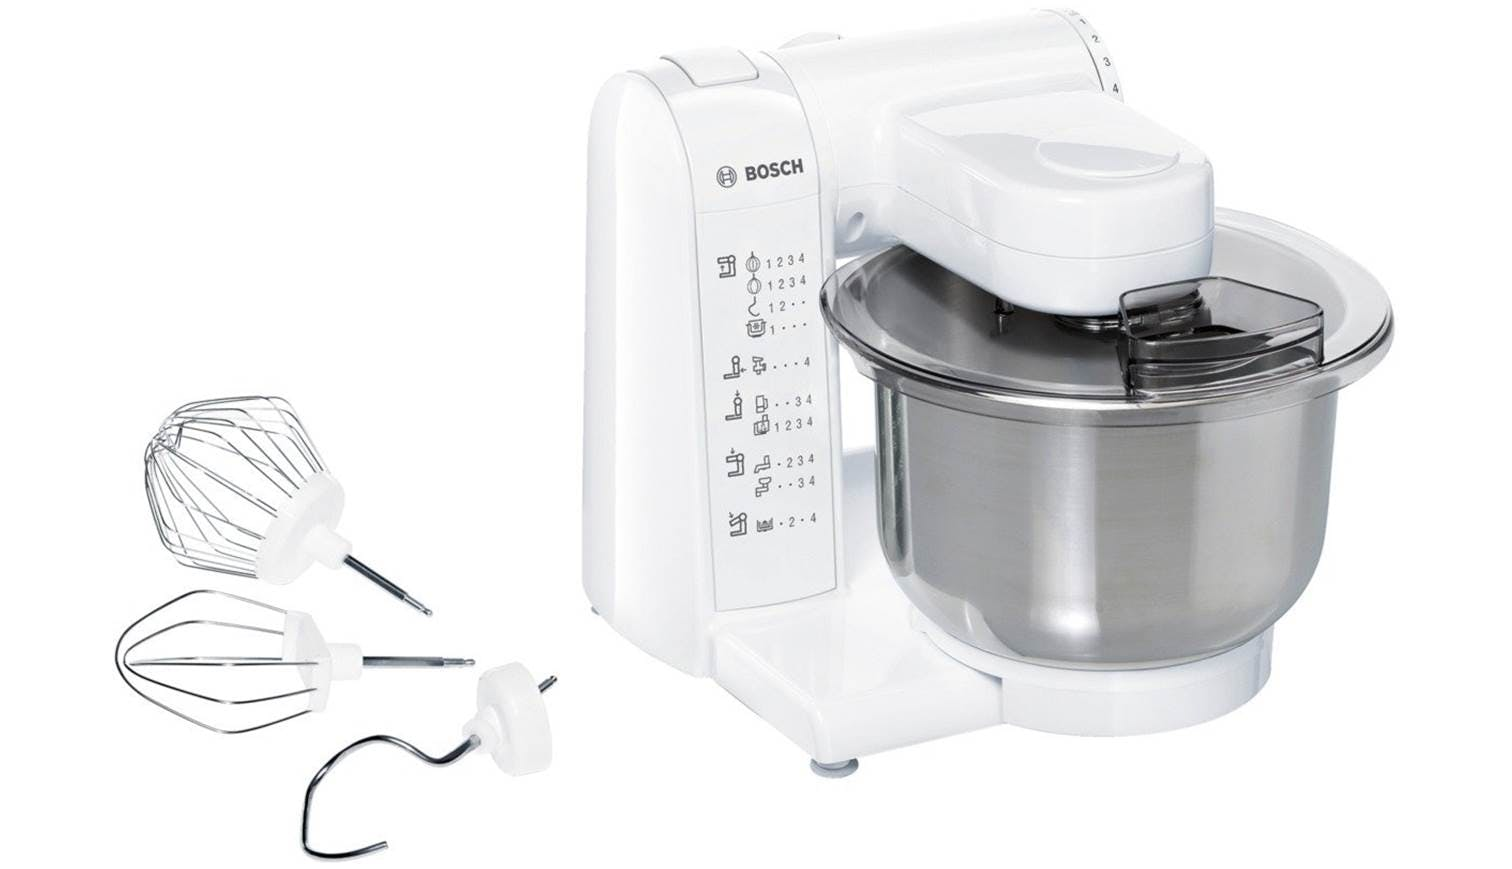 Uncategorized Harvey Norman Kitchen Appliances bosch mum4807gb kitchen machine harvey norman singapore machine